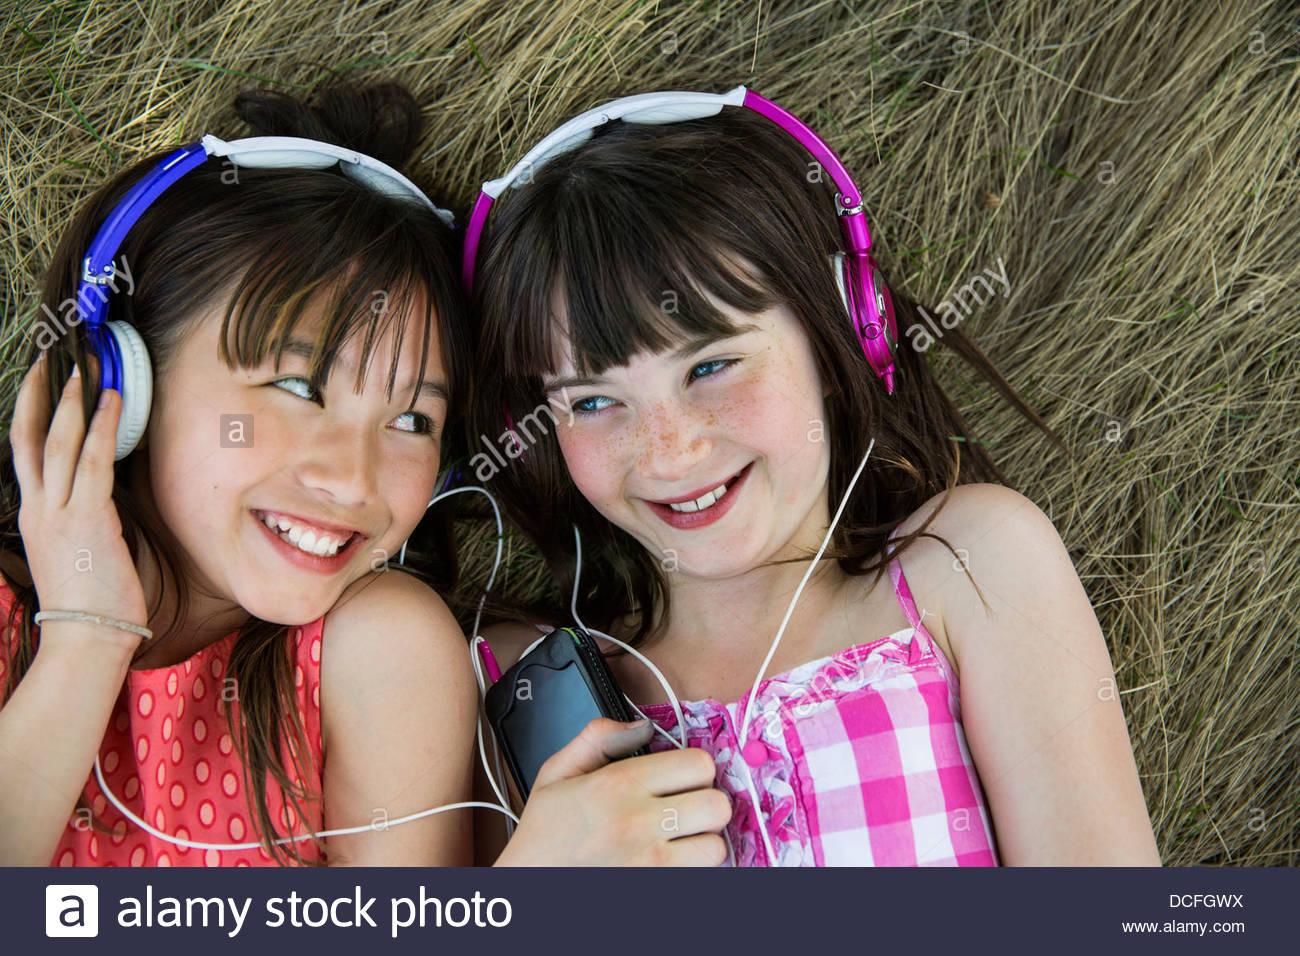 Las niñas acostado escuchando auriculares Imagen De Stock